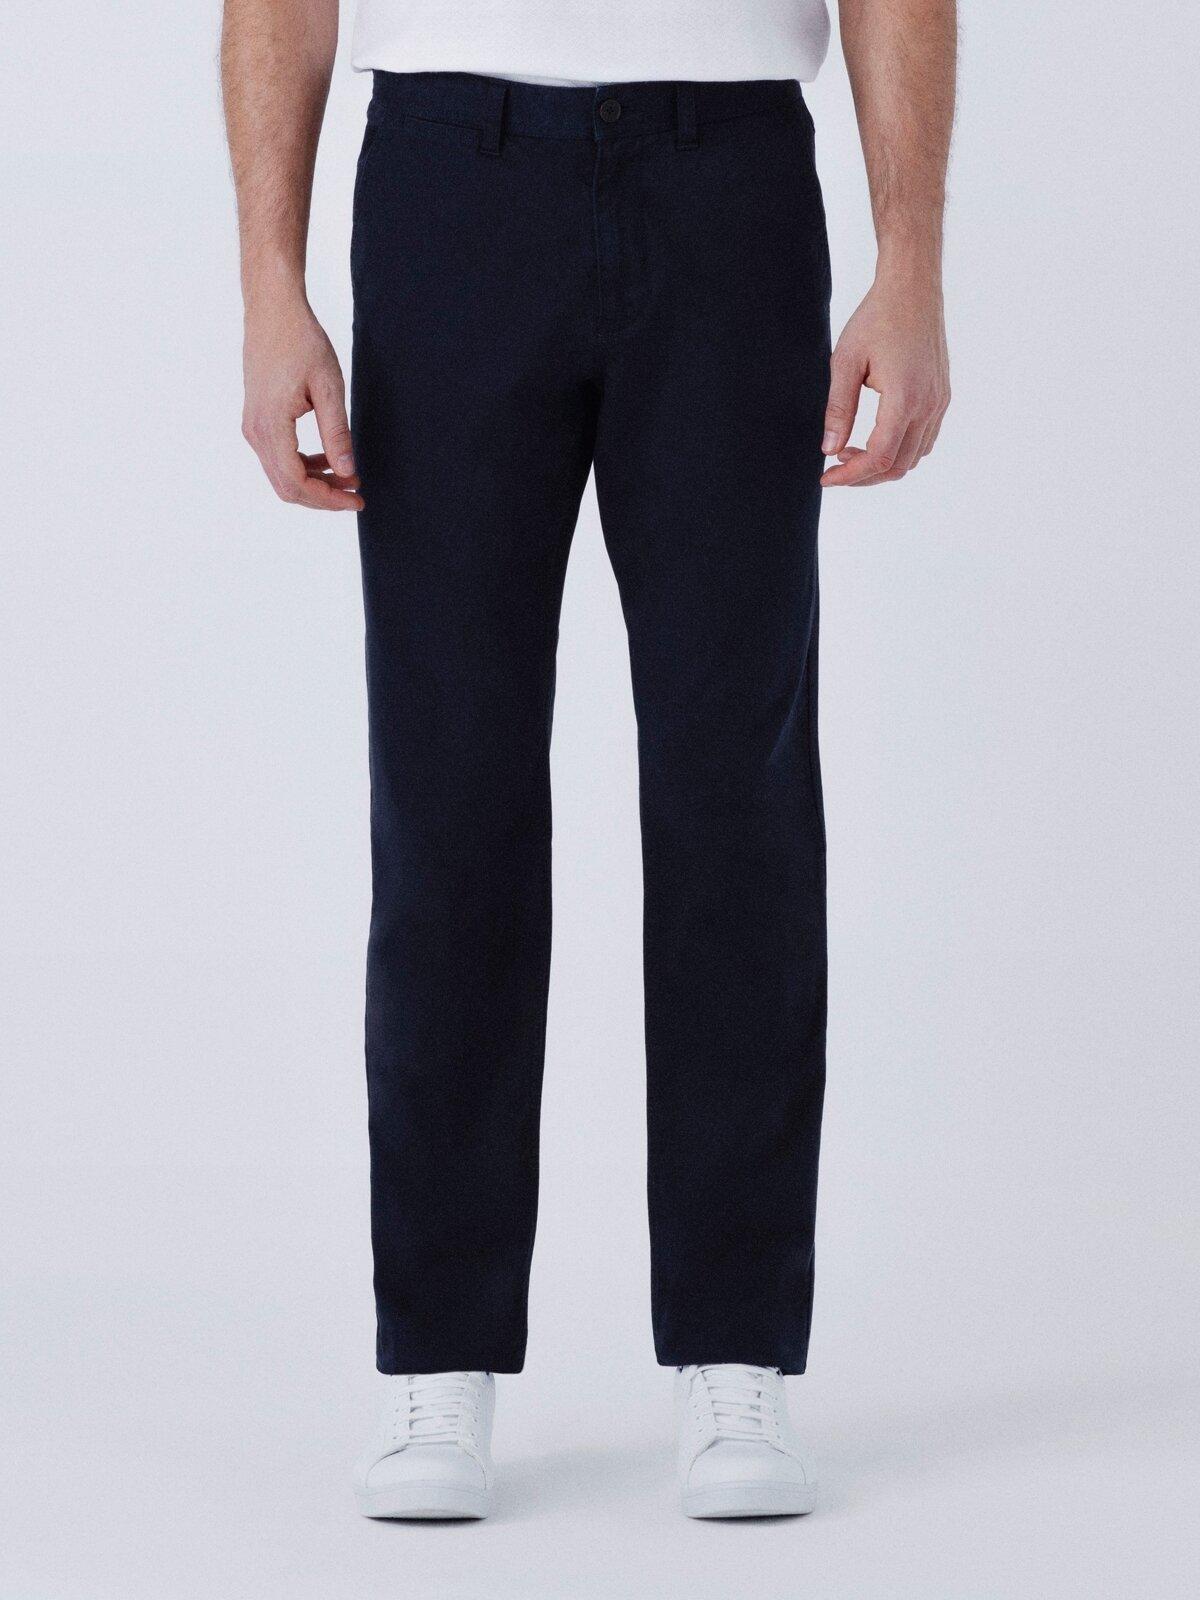 Regular Fit Düz Paça Yüksek Bel Lacivert Erkek Pantolon